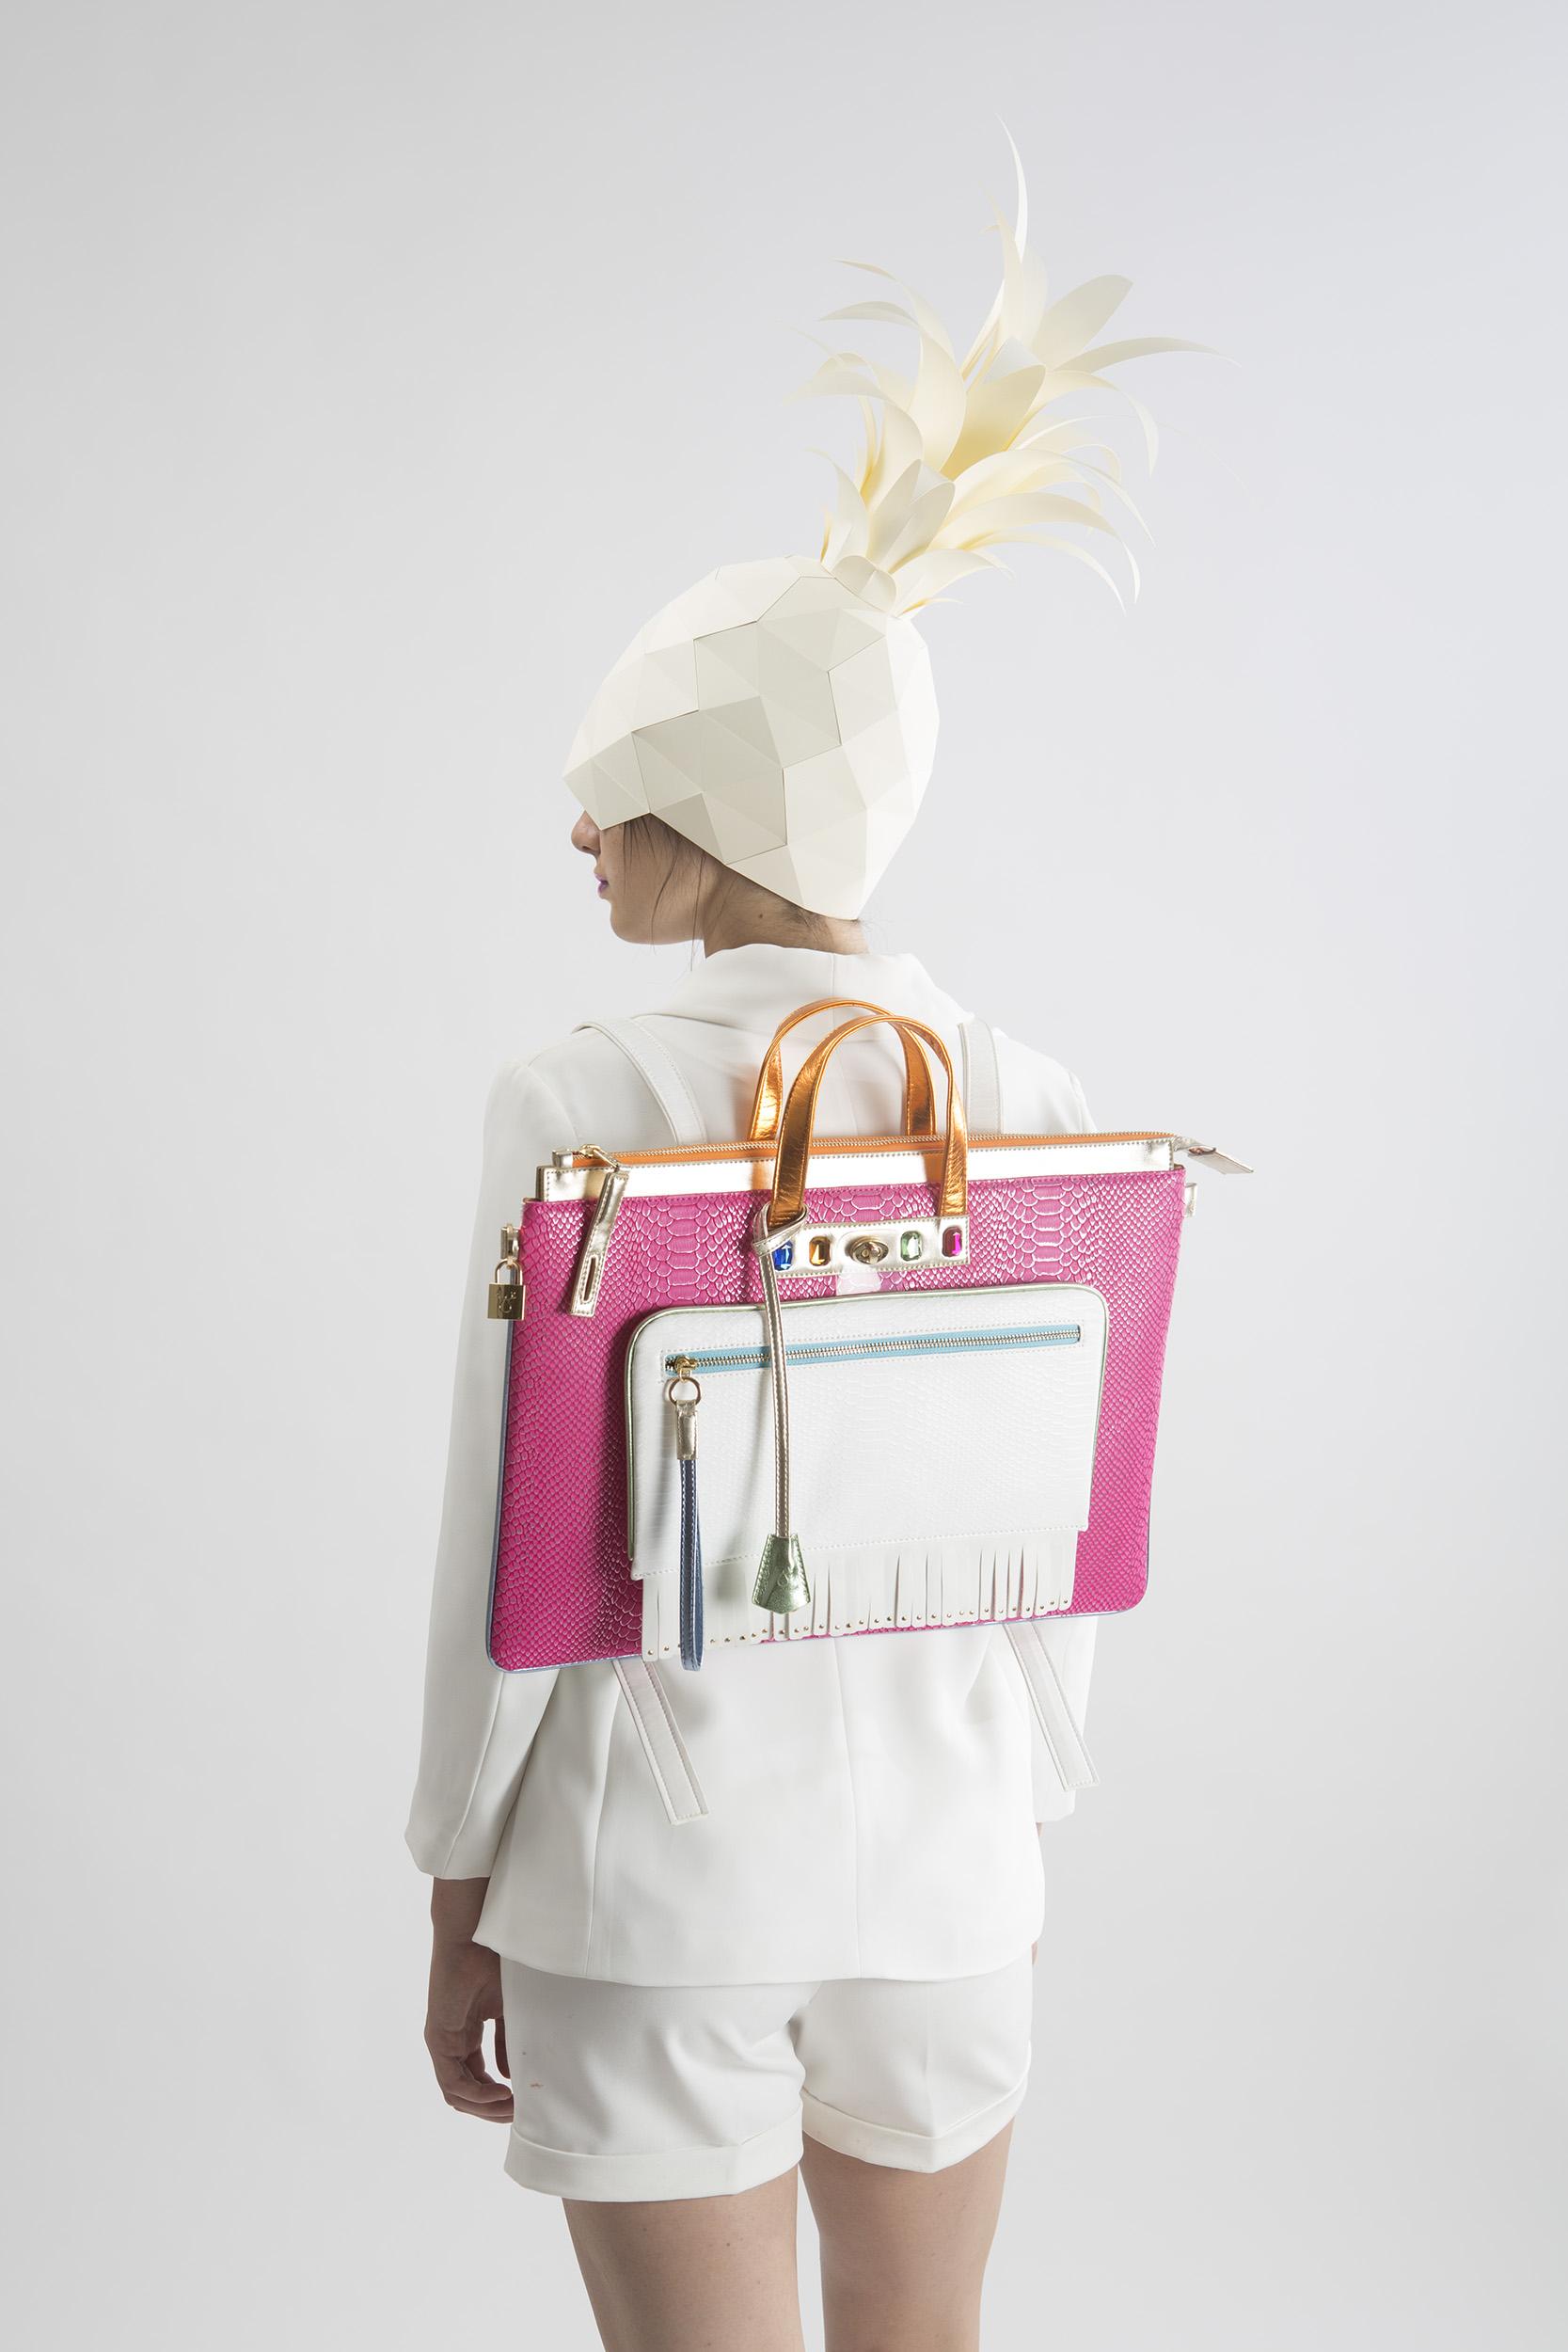 FruitenVeg-MULAYA bag-eco-vegetarian-leather-faux-exotic-skins-large-laptop-backpack-pink-white-orange-nyc-handbag-designer